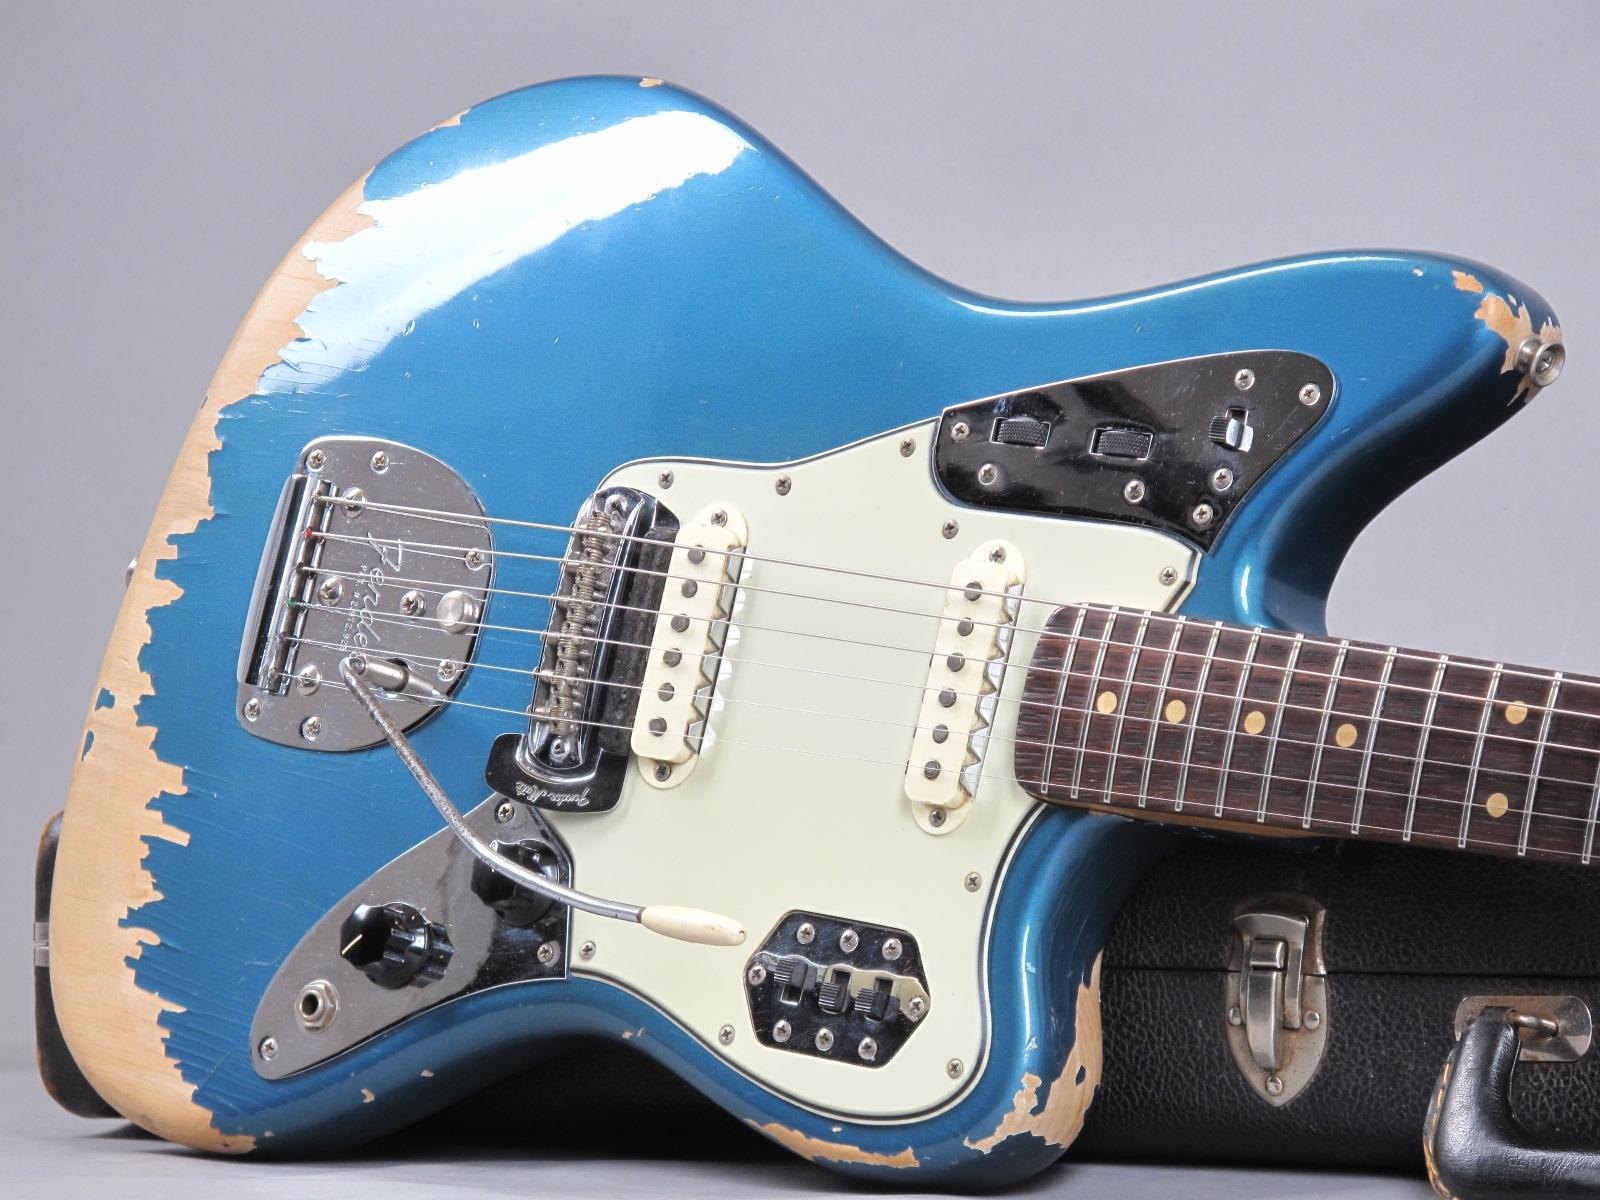 https://guitarpoint.de/app/uploads/products/1964-fender-jaguar-lake-placid-blue/1964-Fender-Jaguar-Lake-Placid-Blue-L27443_19.jpg